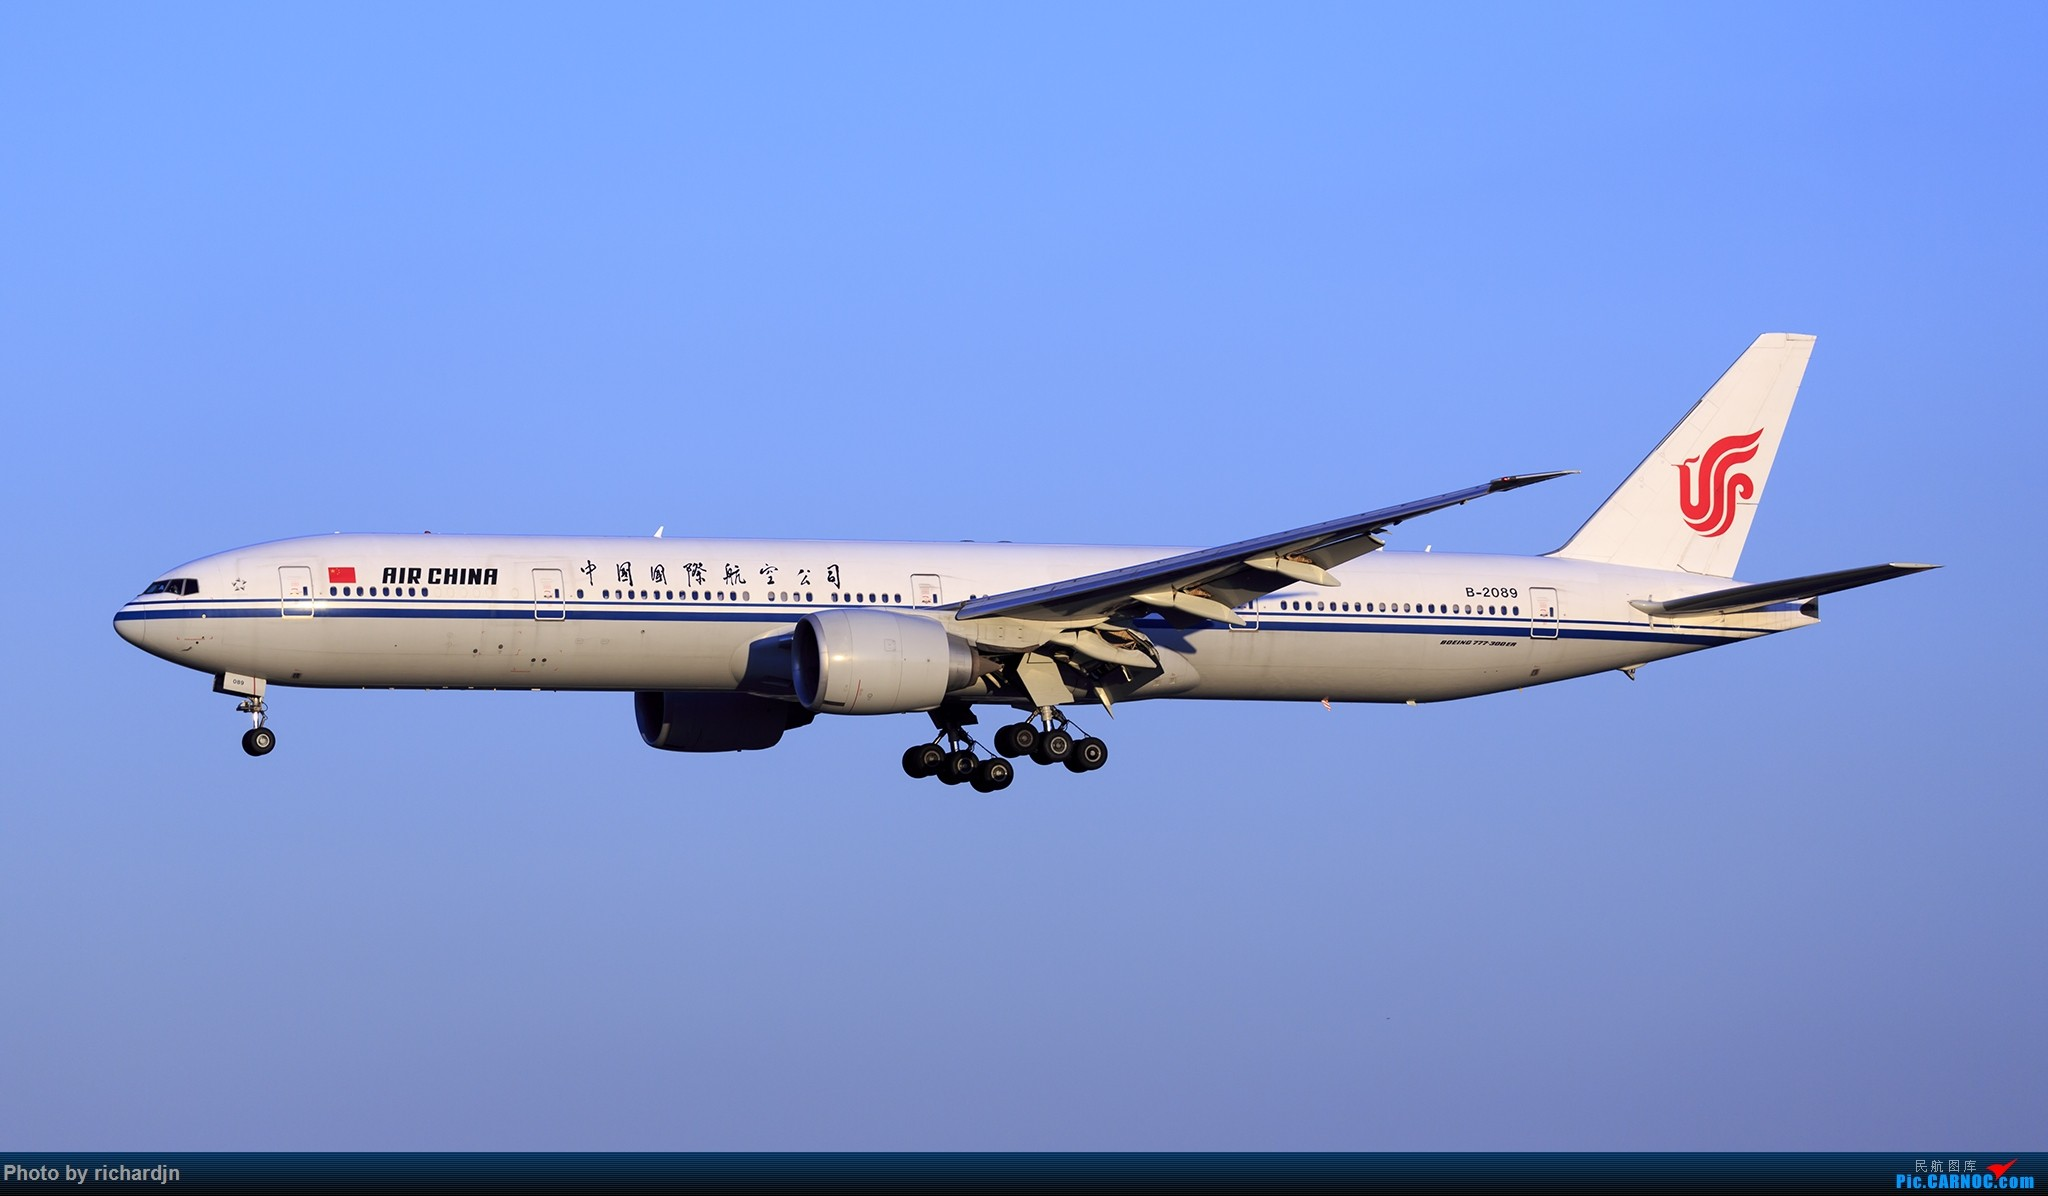 Re:[原创]2018年10月1日ZBAA撸机 BOEING 777-300ER B-2089 中国北京首都国际机场